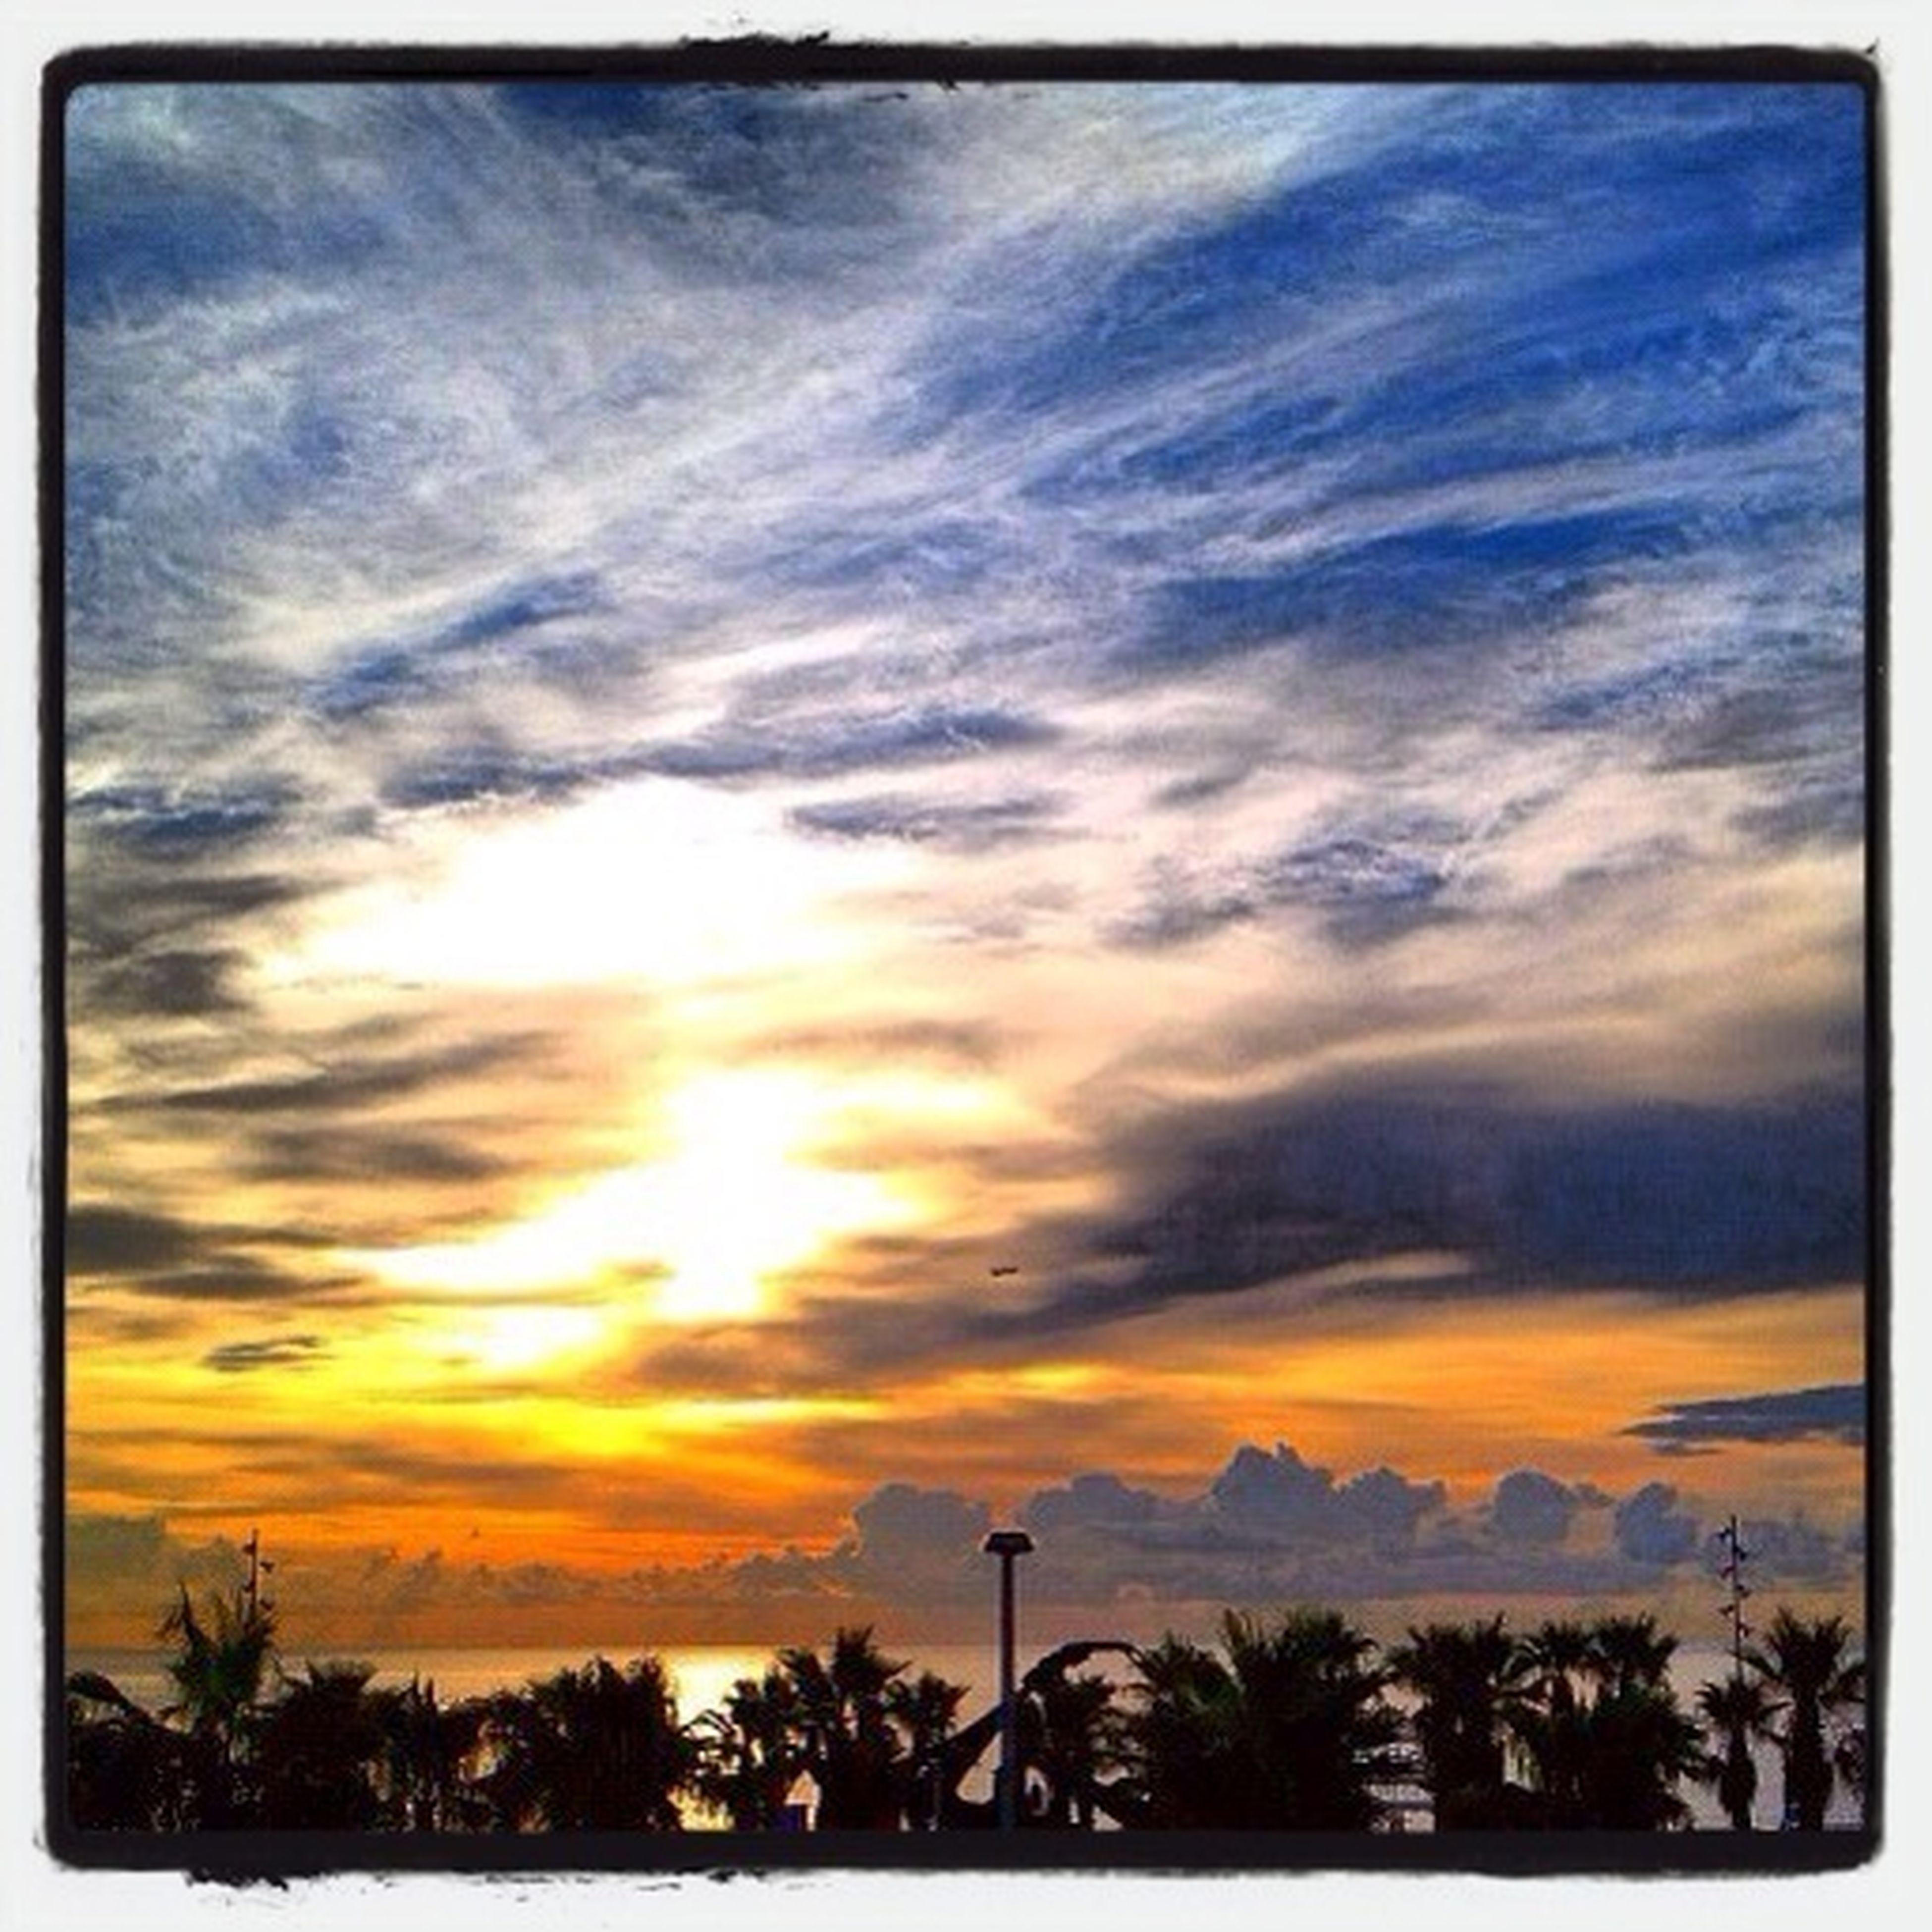 sunset, beauty in nature, sky, scenics, tranquil scene, tranquility, tree, silhouette, orange color, transfer print, cloud - sky, nature, idyllic, sun, landscape, cloud, auto post production filter, growth, sunlight, dramatic sky